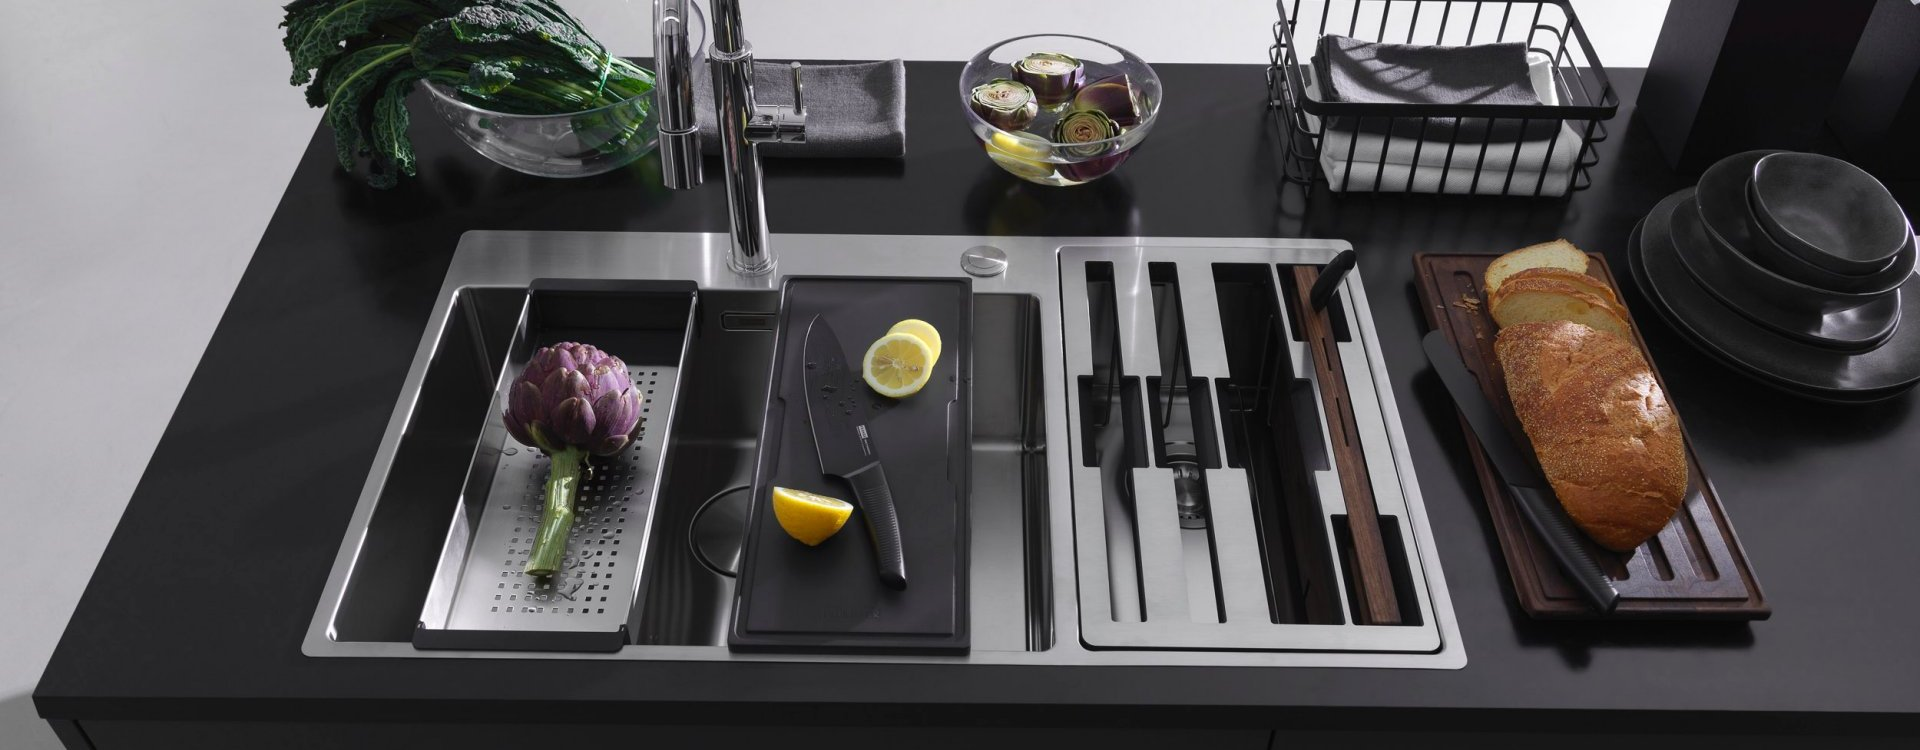 franke box spüle armatur küche